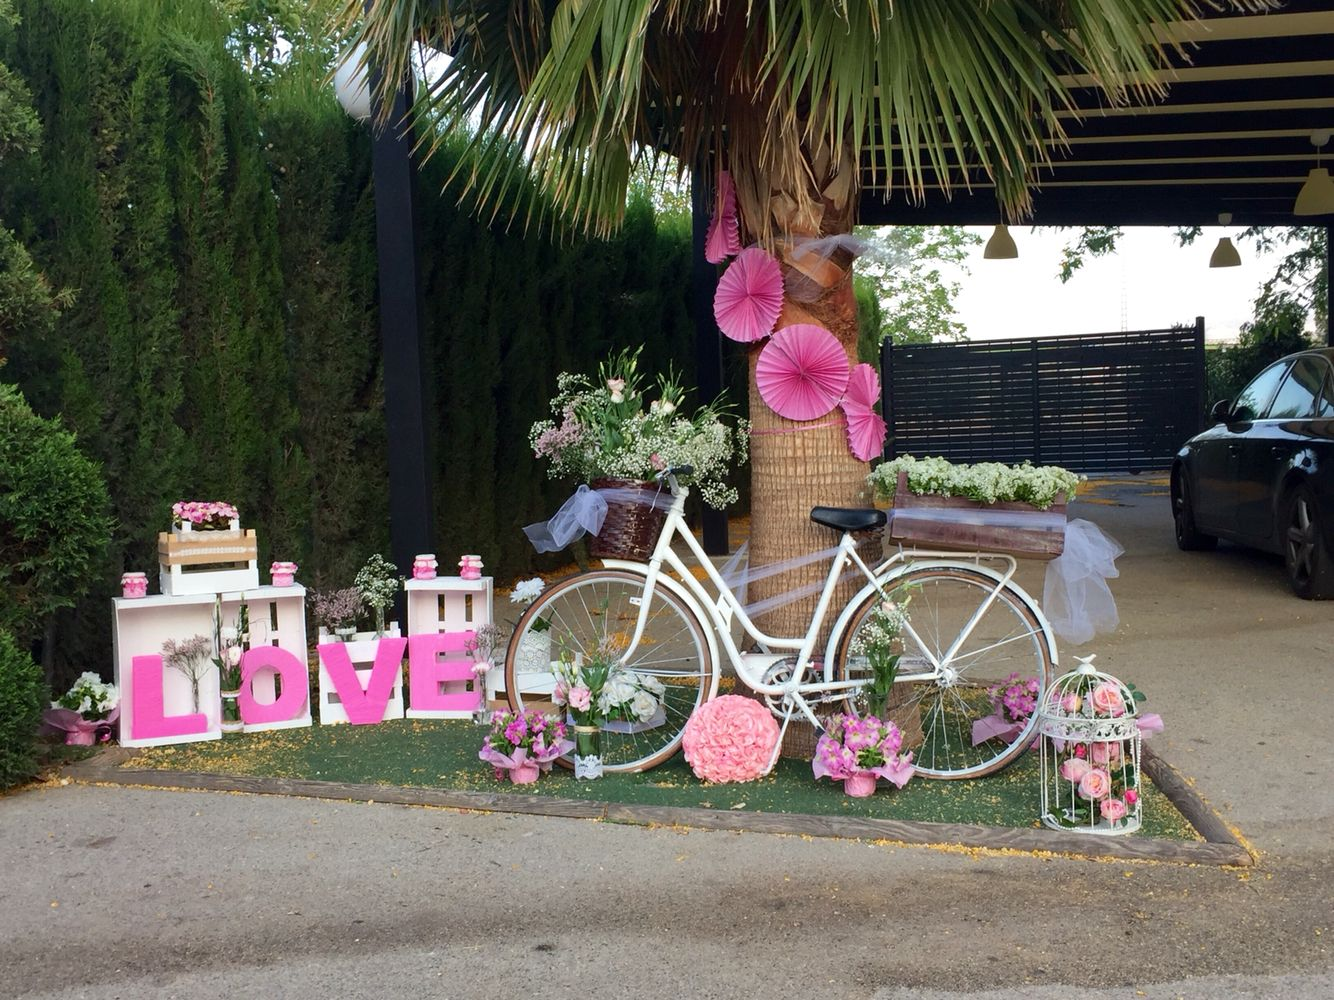 Decoracion boda vintage rom ntica bici con flores for Decoracion boda romantica